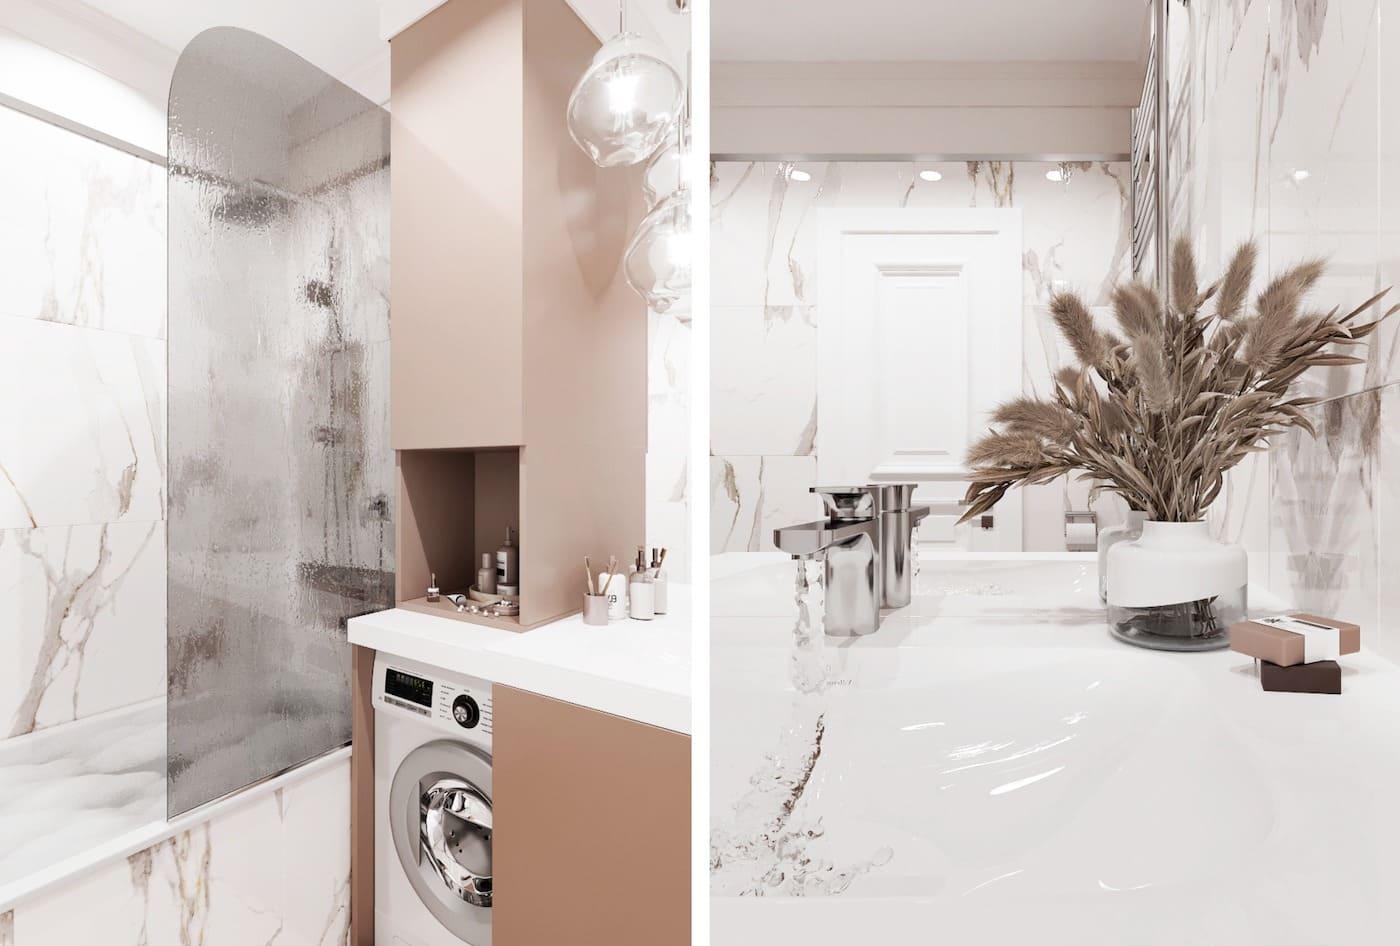 дизайн однокомнатной квартиры фото 33